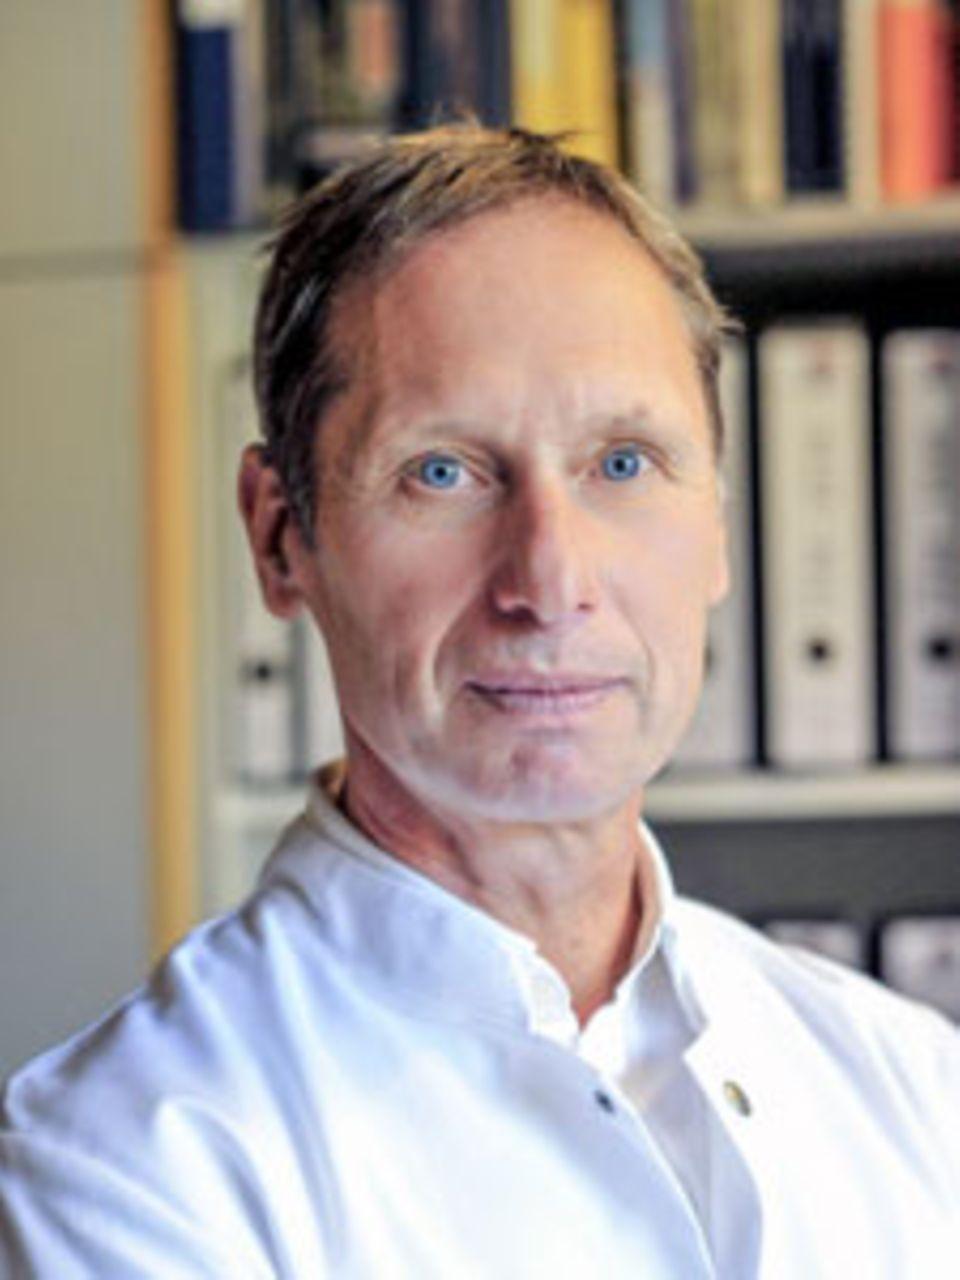 Professor Dr. med. Achim Peters